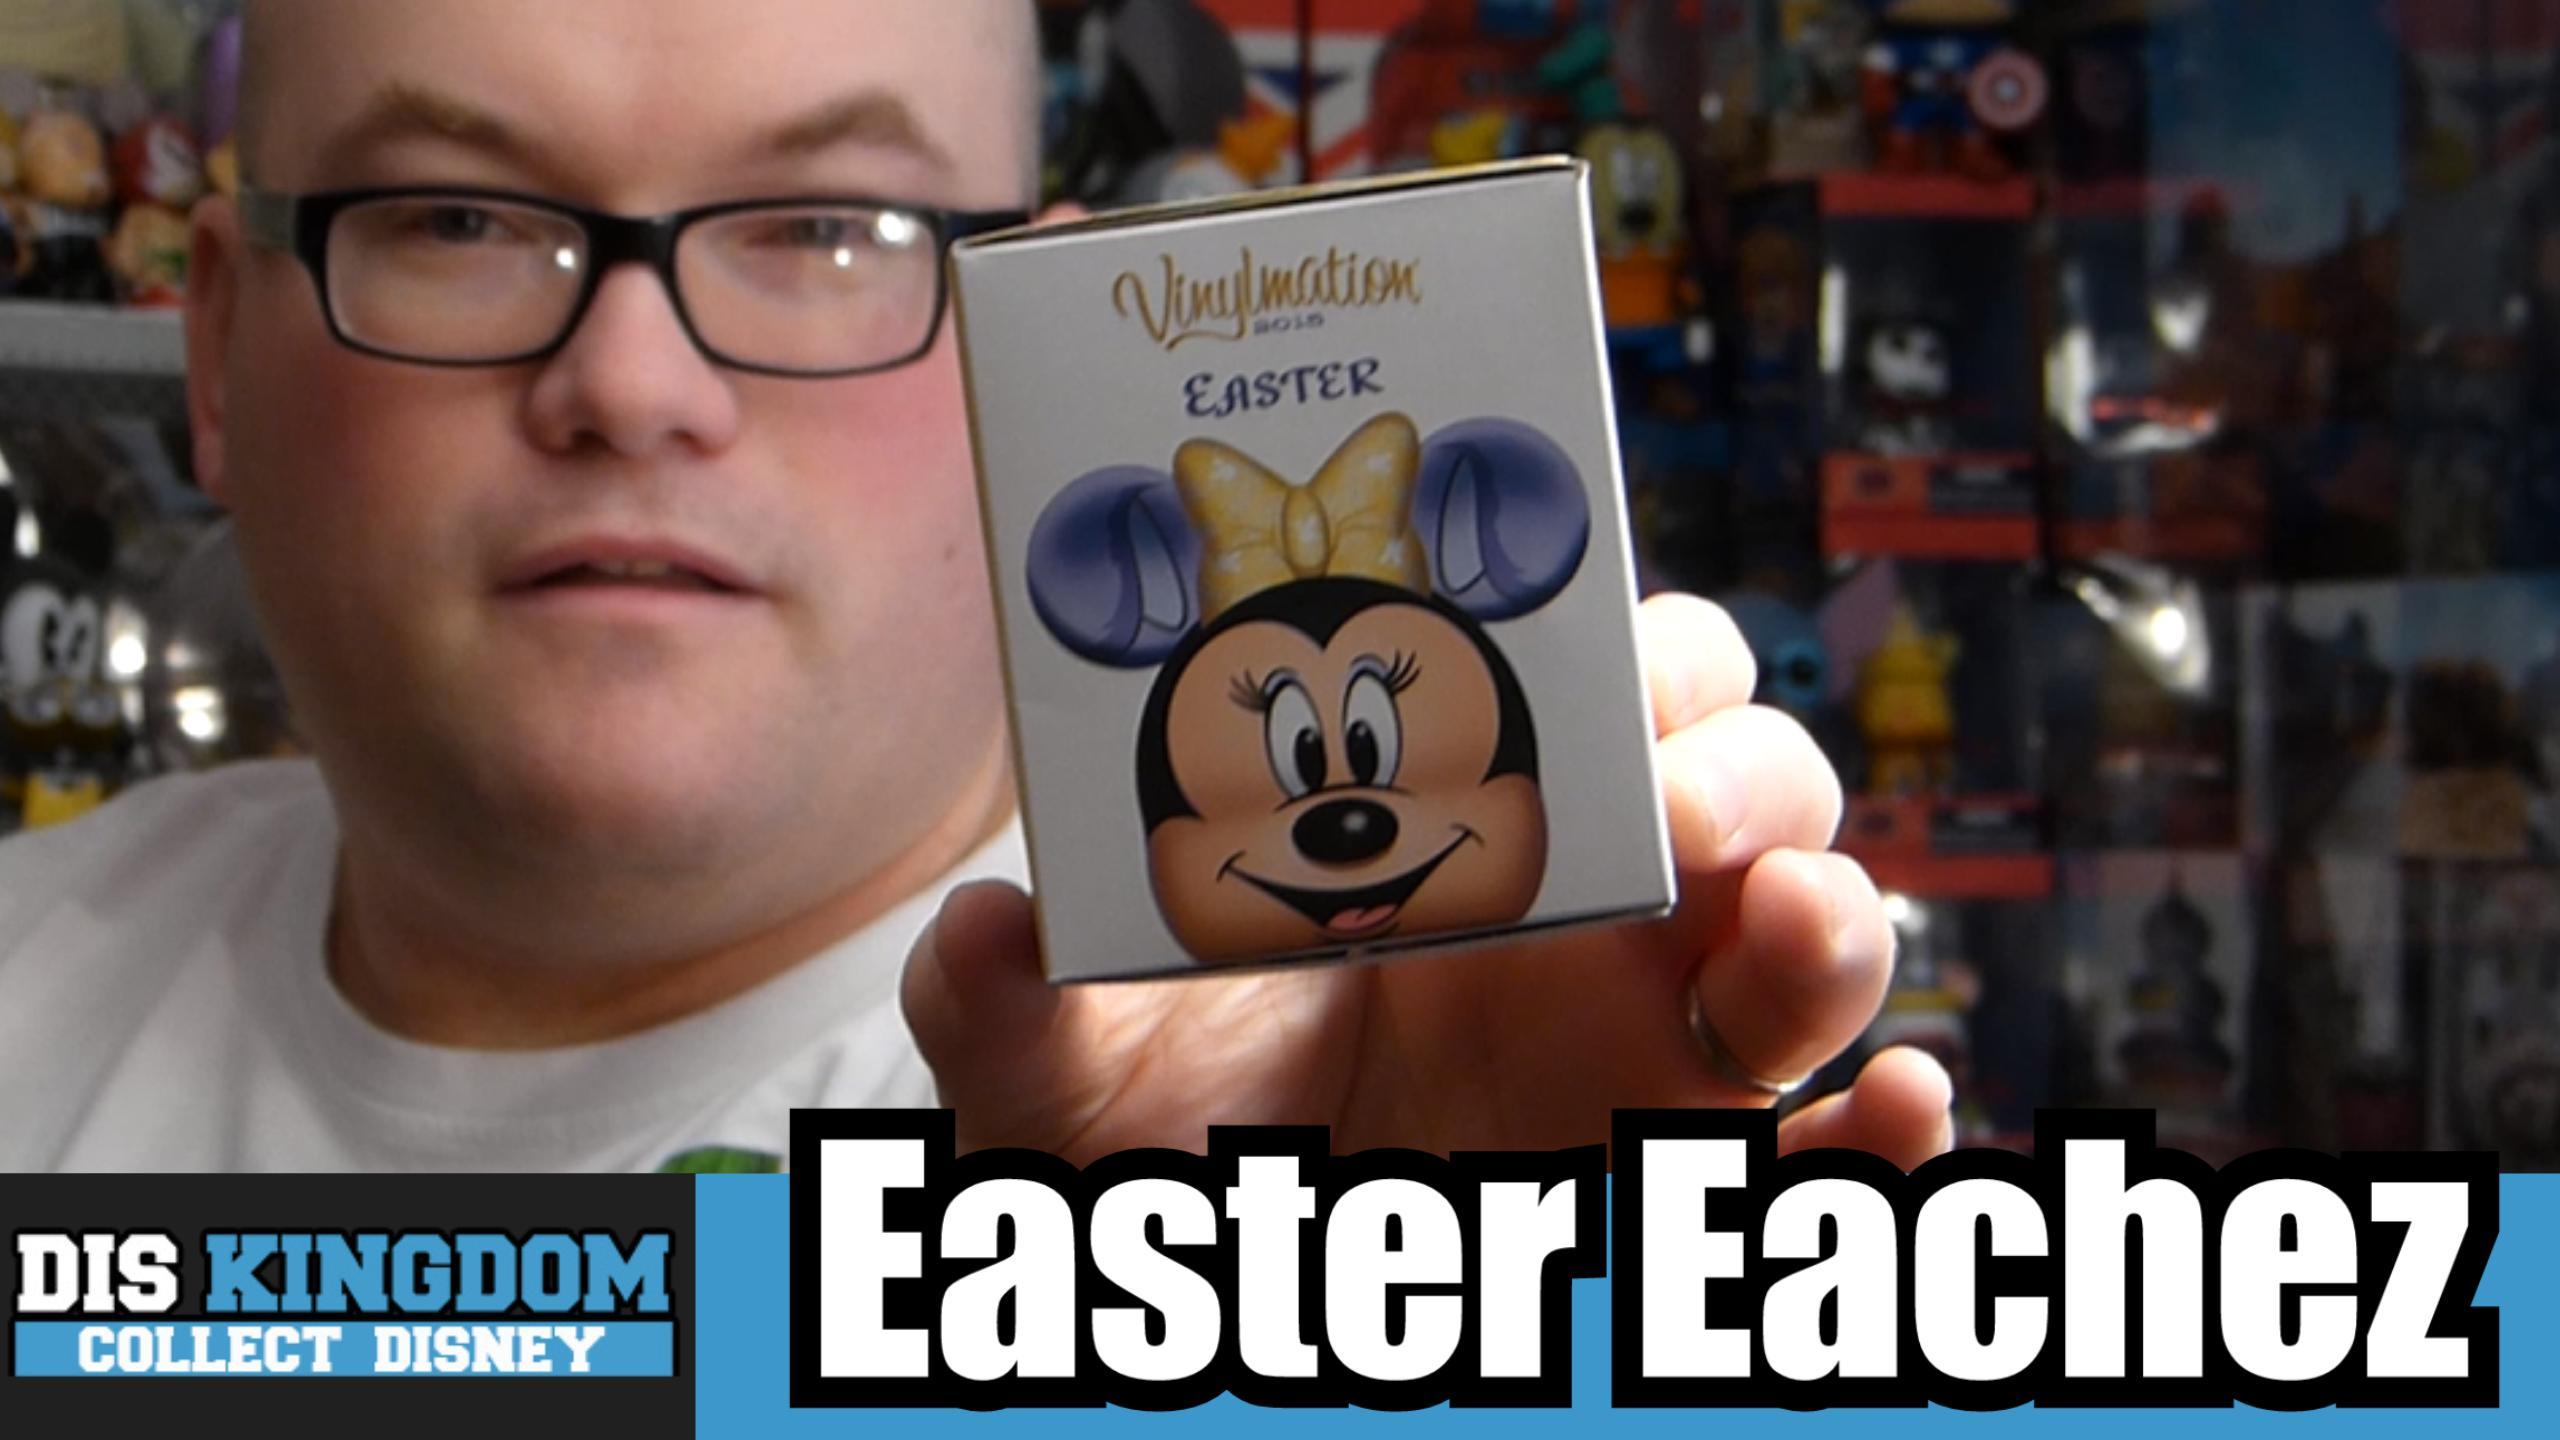 Easter Mickey Mouse Eachez Vinylmation Unboxing